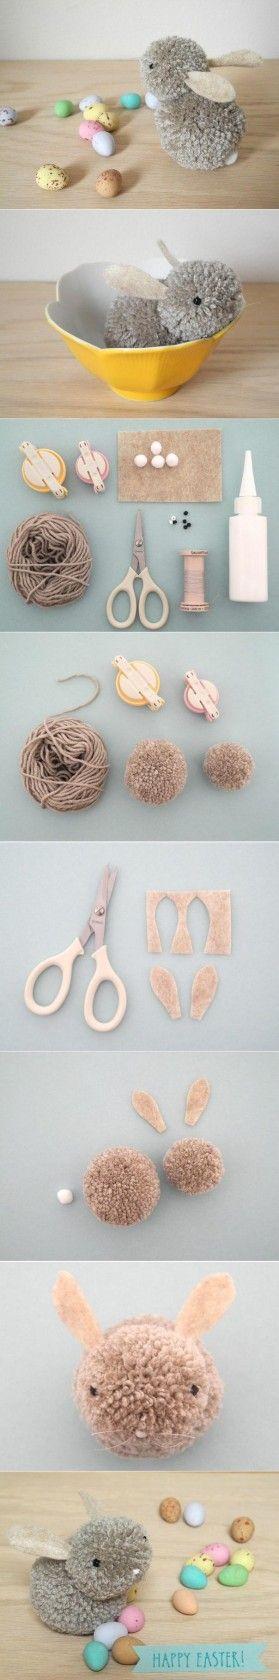 How to Make a Pom Pom Bunny